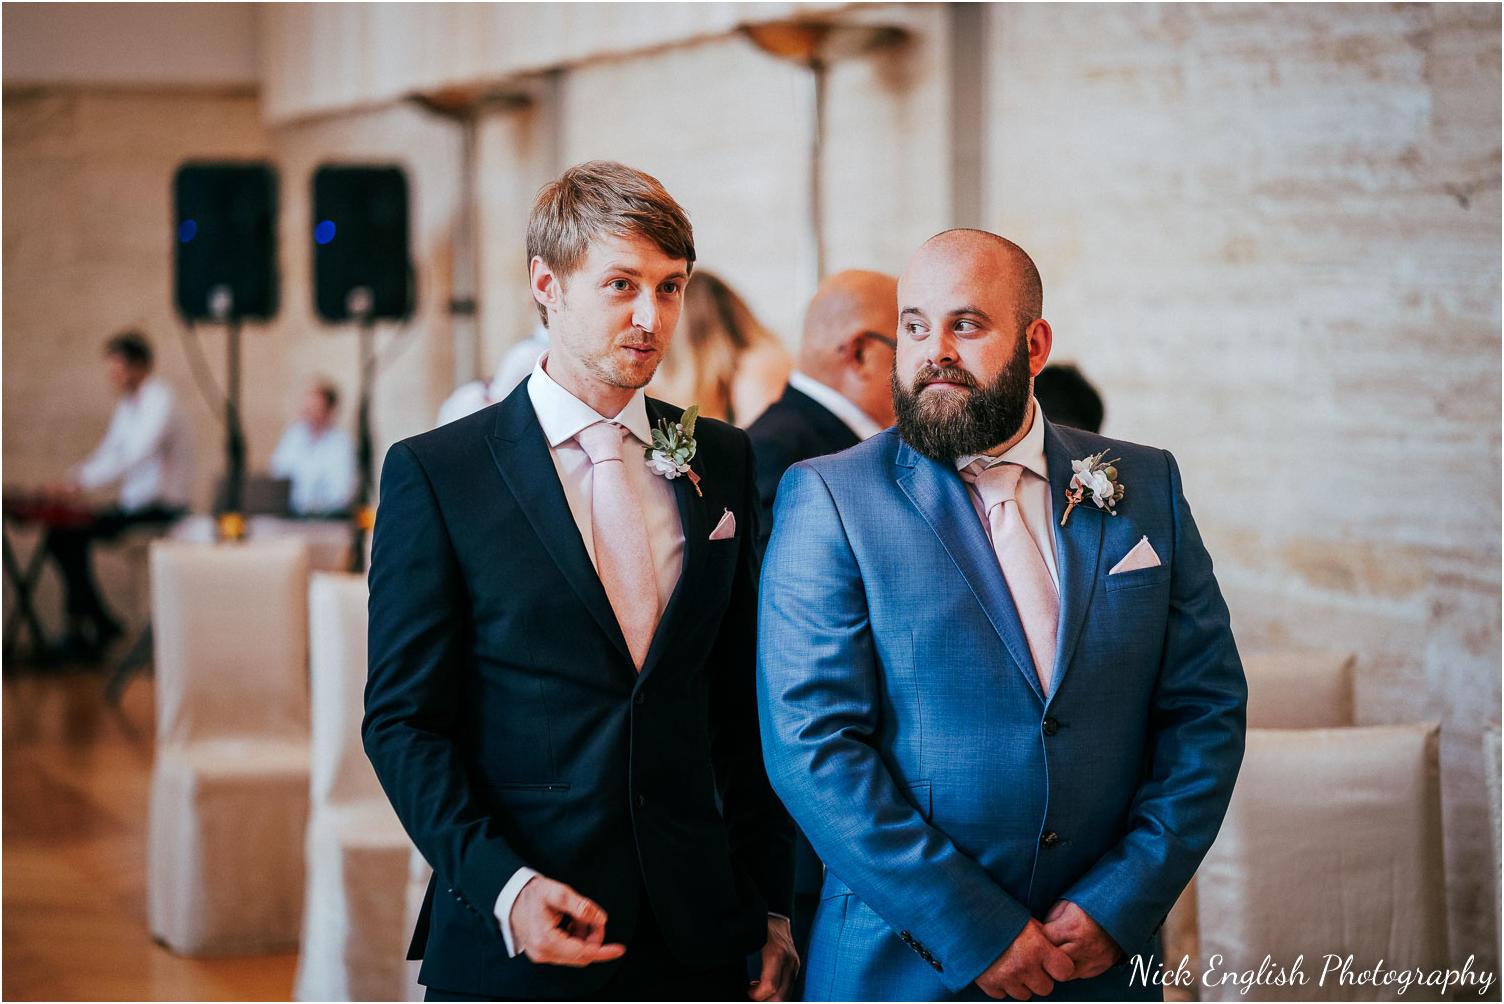 Destination_Wedding_Photographer_Slovenia_Nick_English_Photography-34.jpg